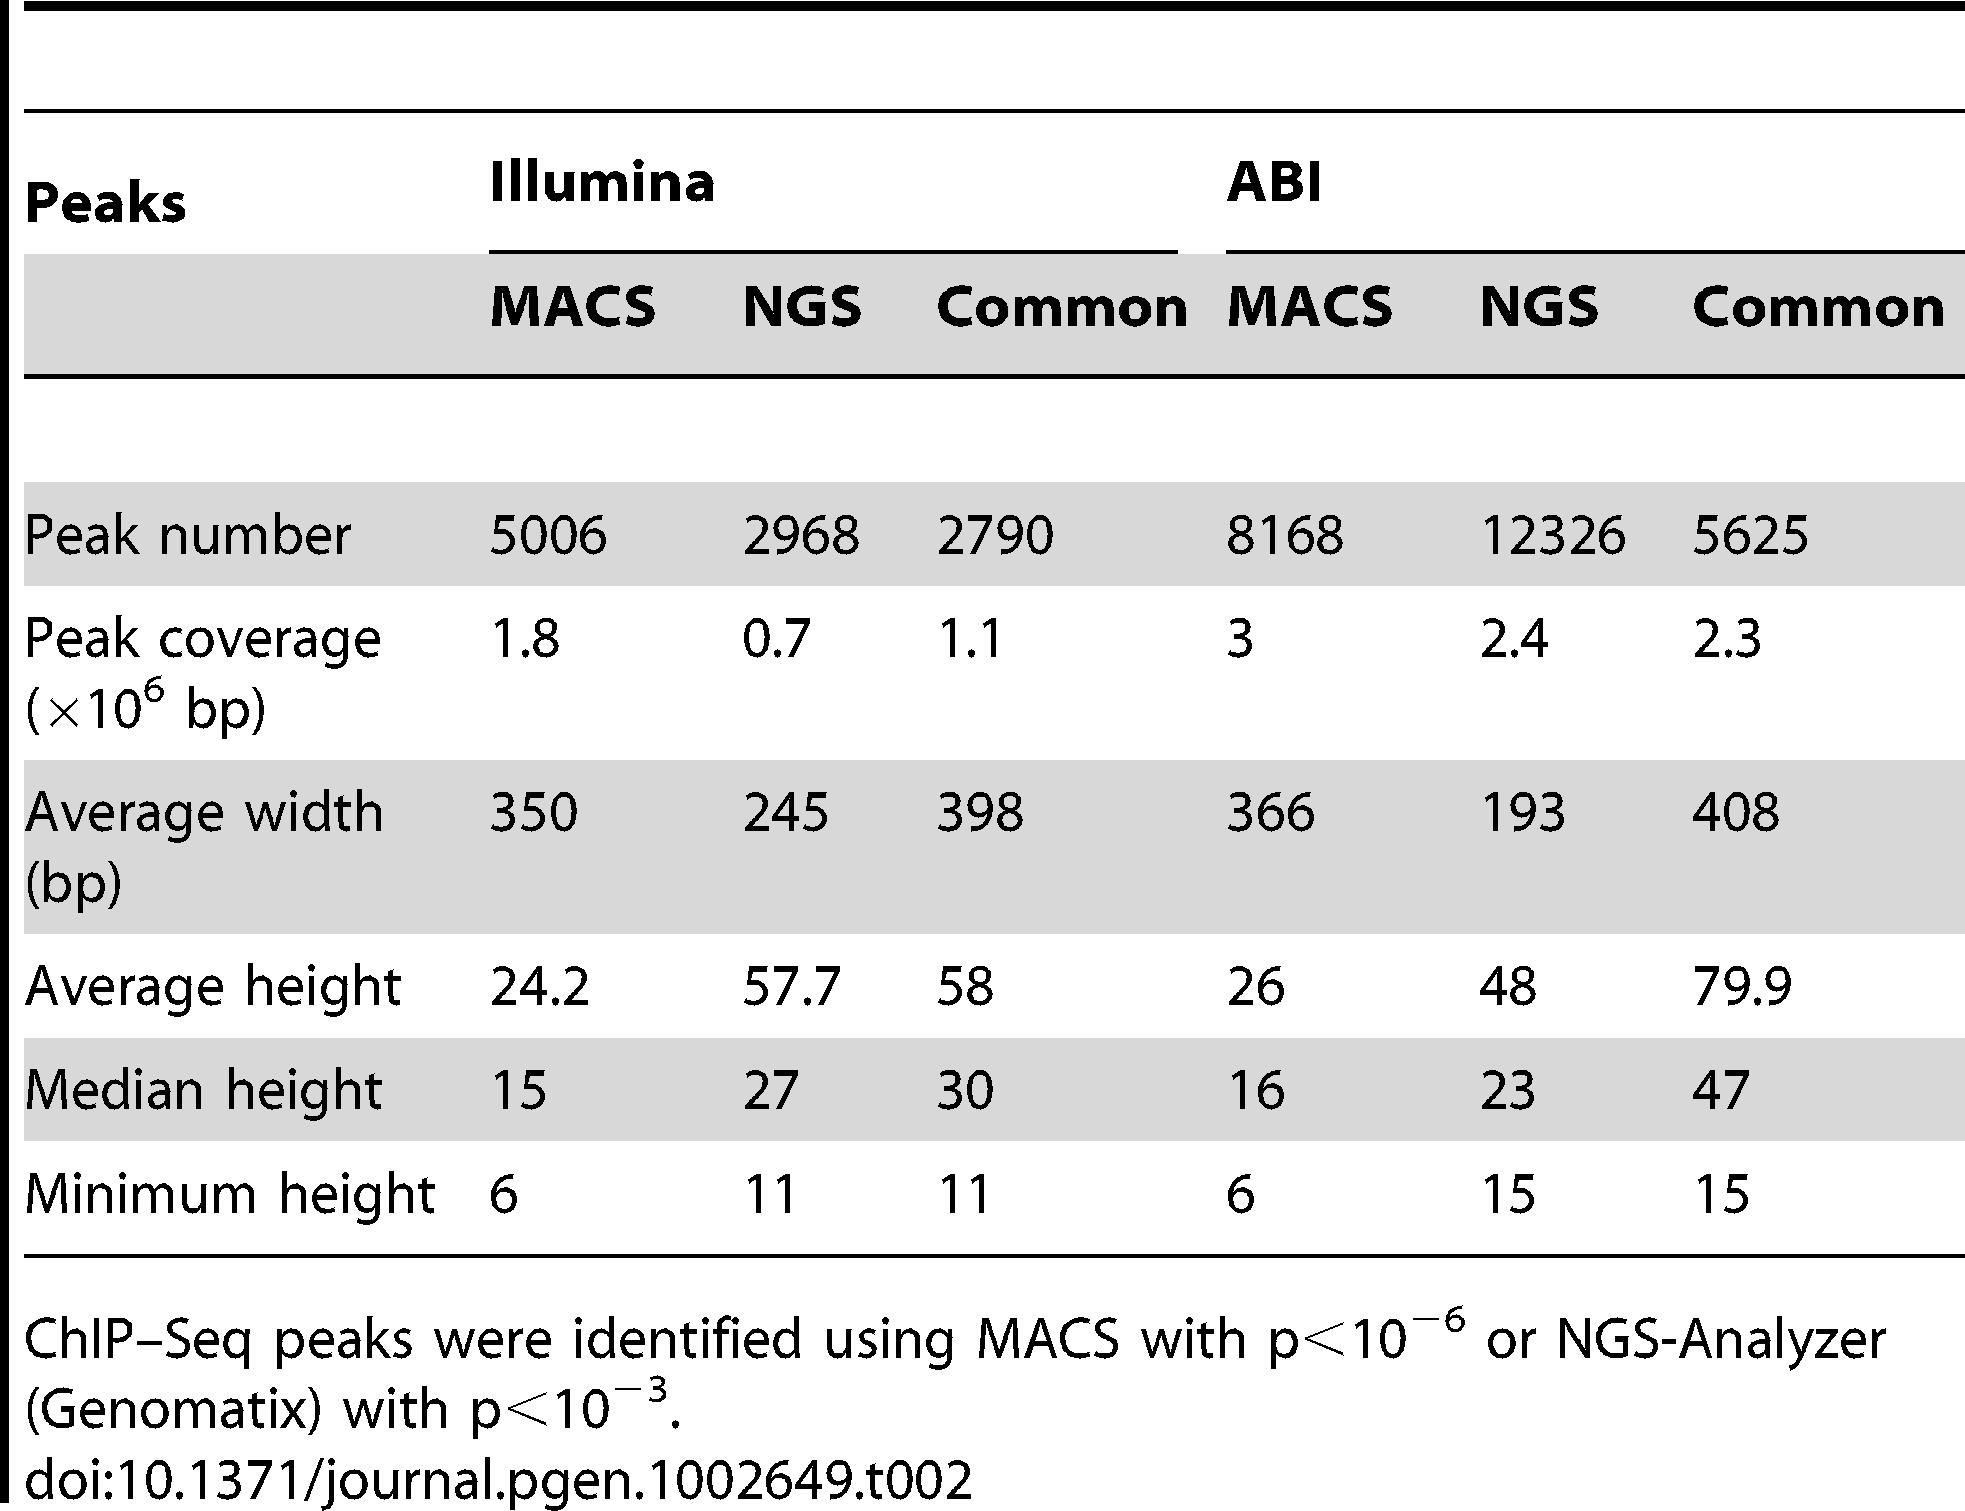 Comparison of ChIP–Seq peaks by Illumina and ABI.